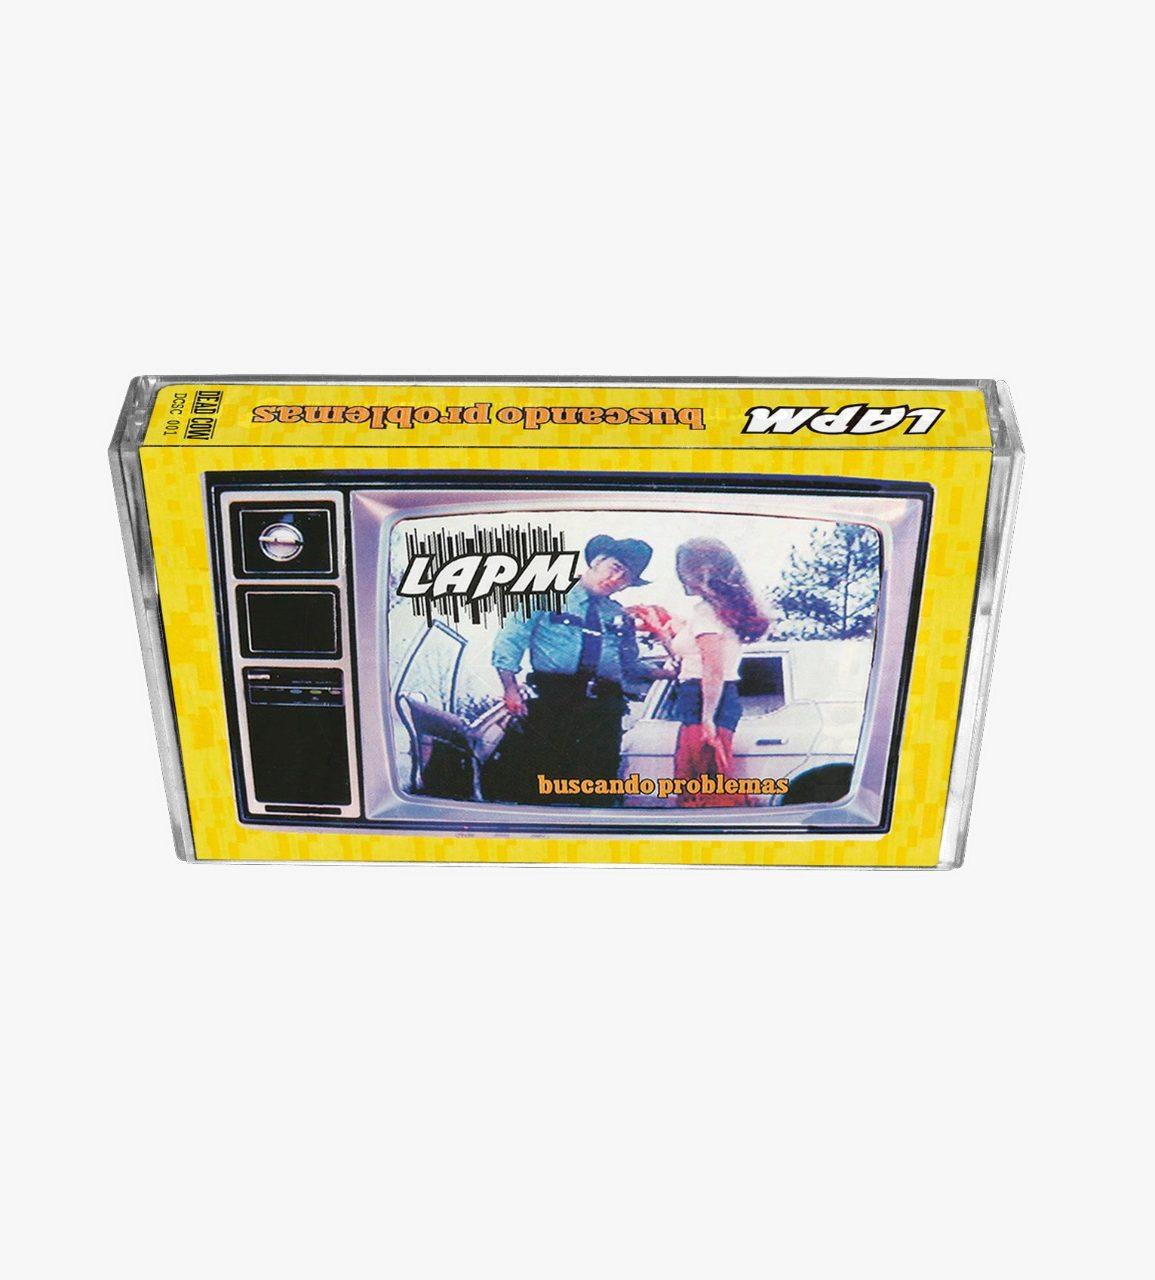 LAPM - Buscando Problemas versión de aniversario en Cassette